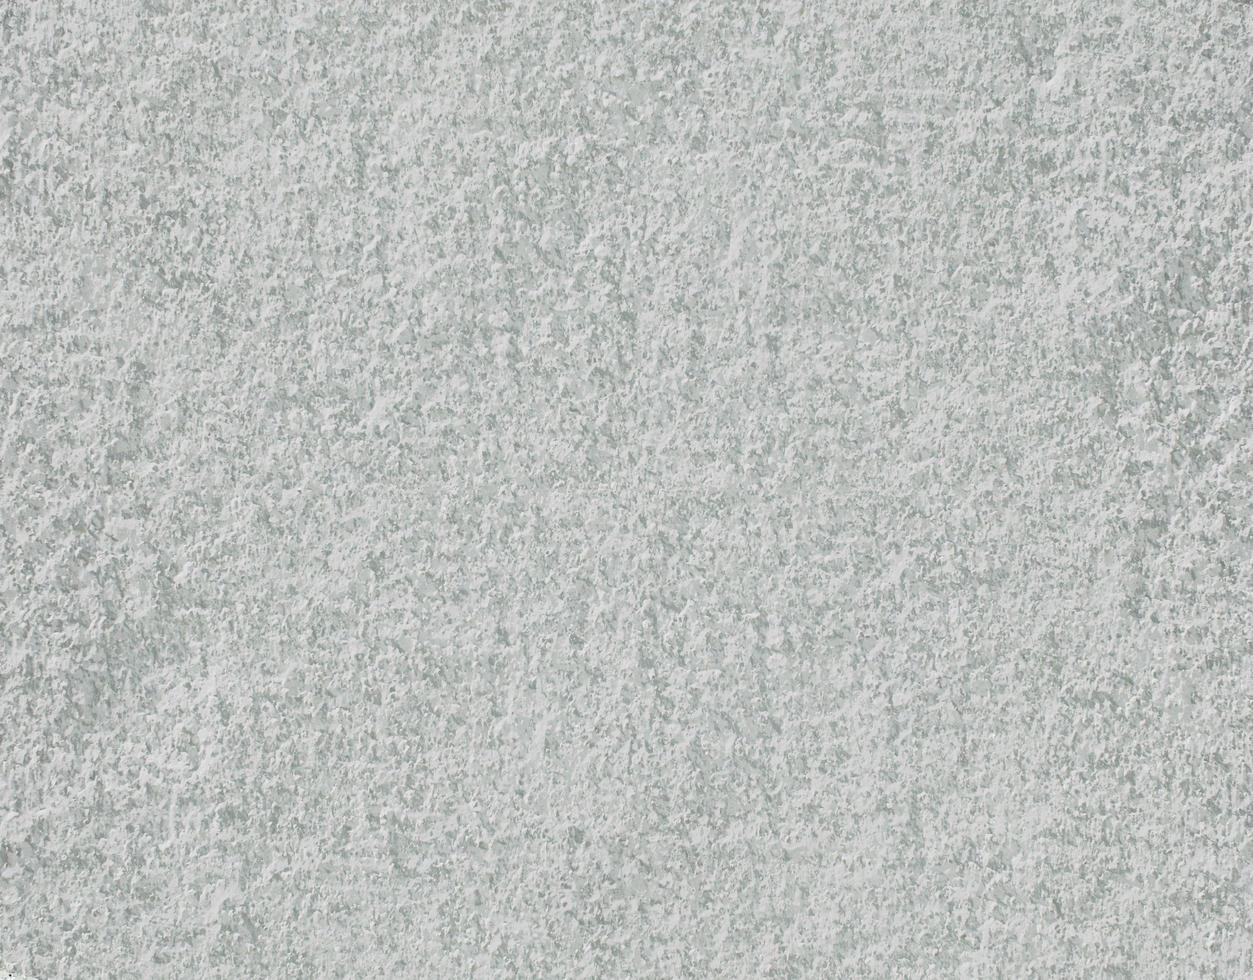 textura de parede limpa foto